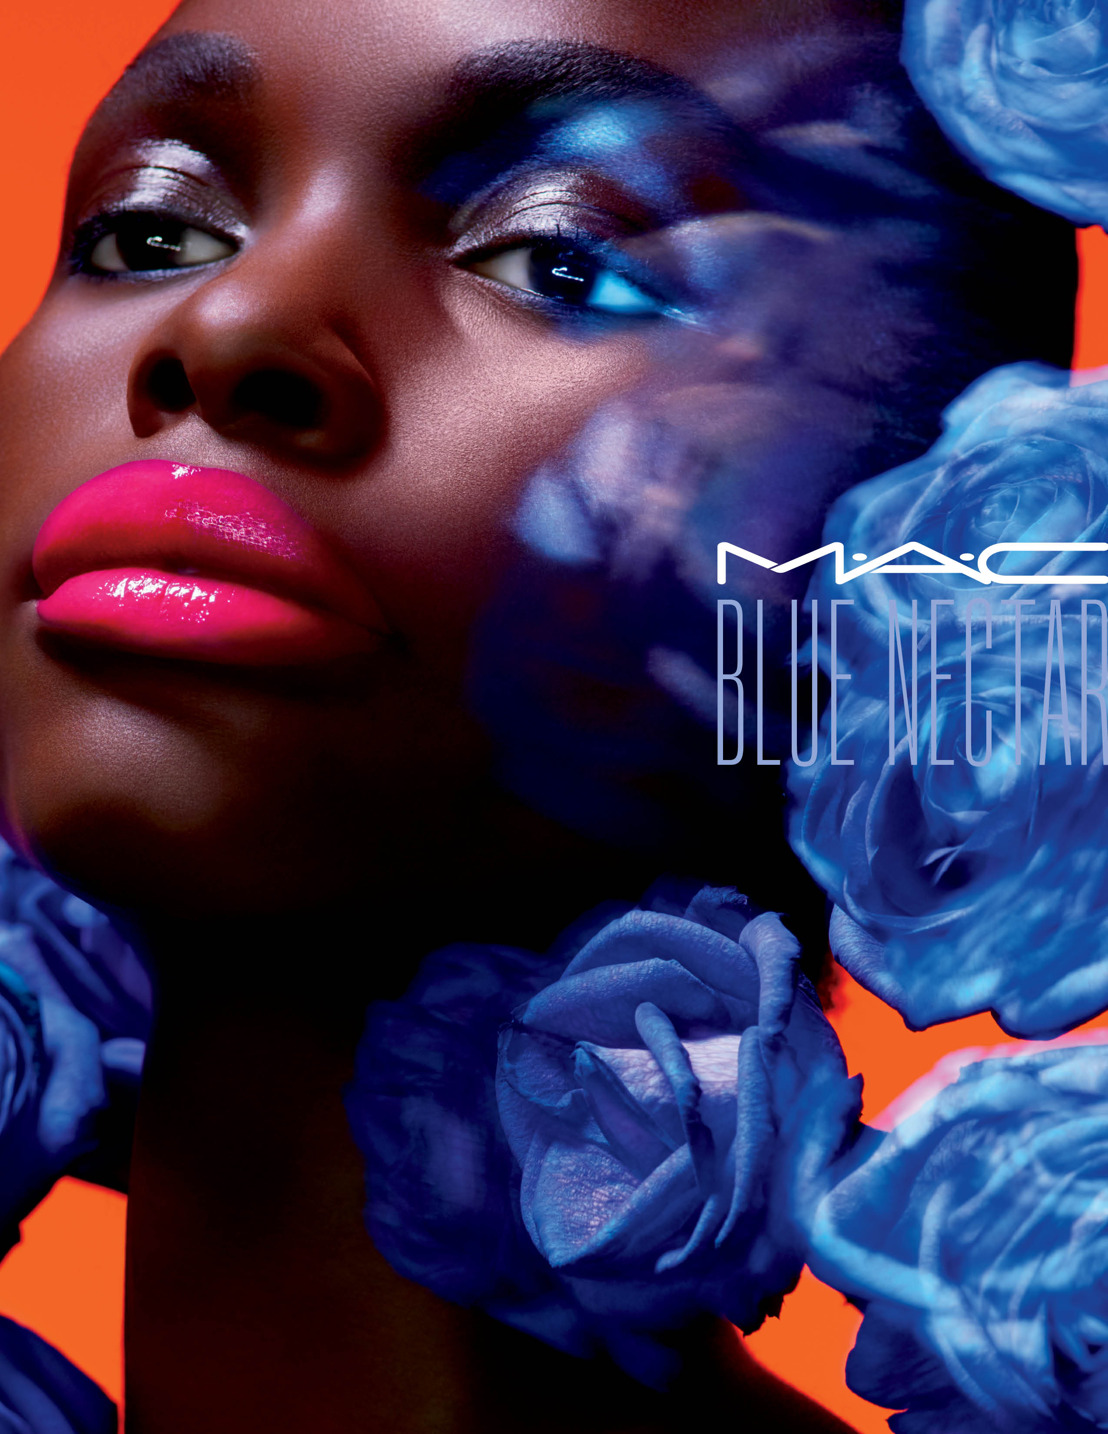 M.A.C Cosmetics - Blue Nectar